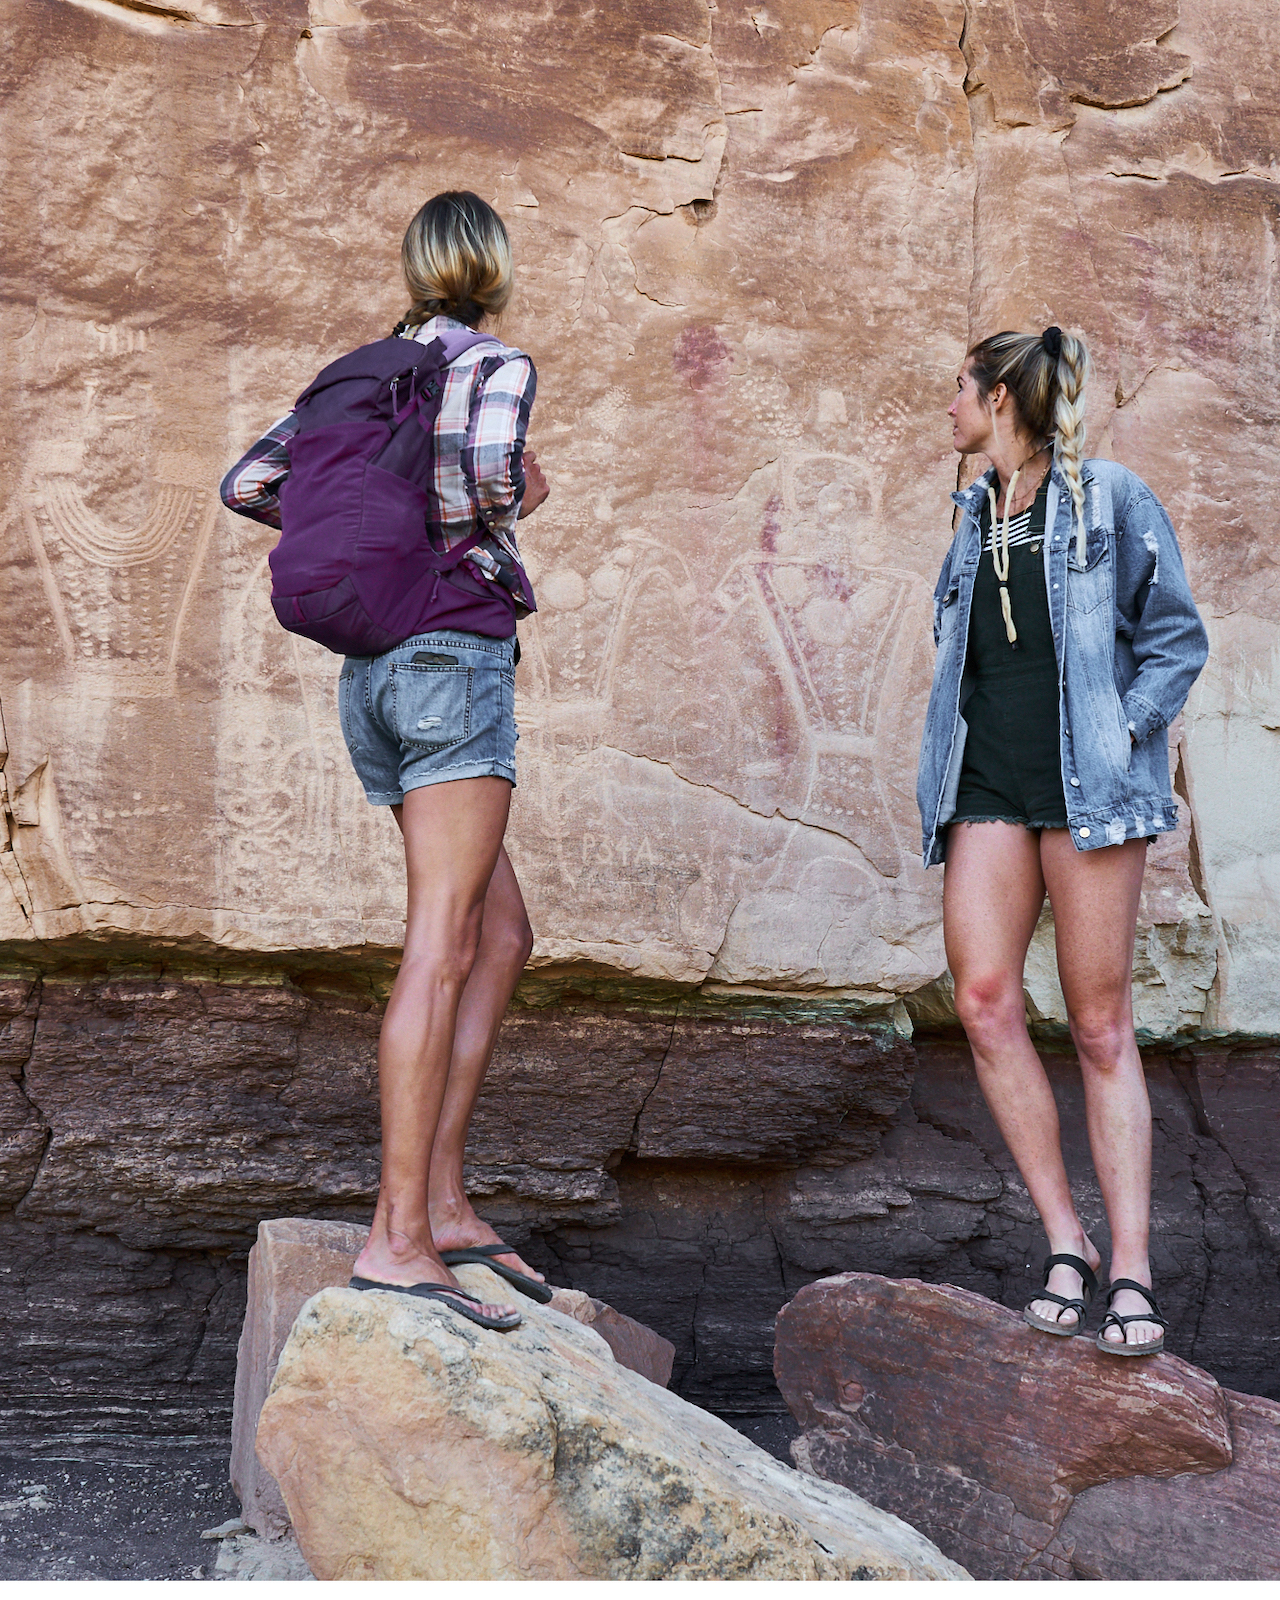 Two hikers looking at petroglyphs at Smithsonian Butte, Dinosaurland, Utah